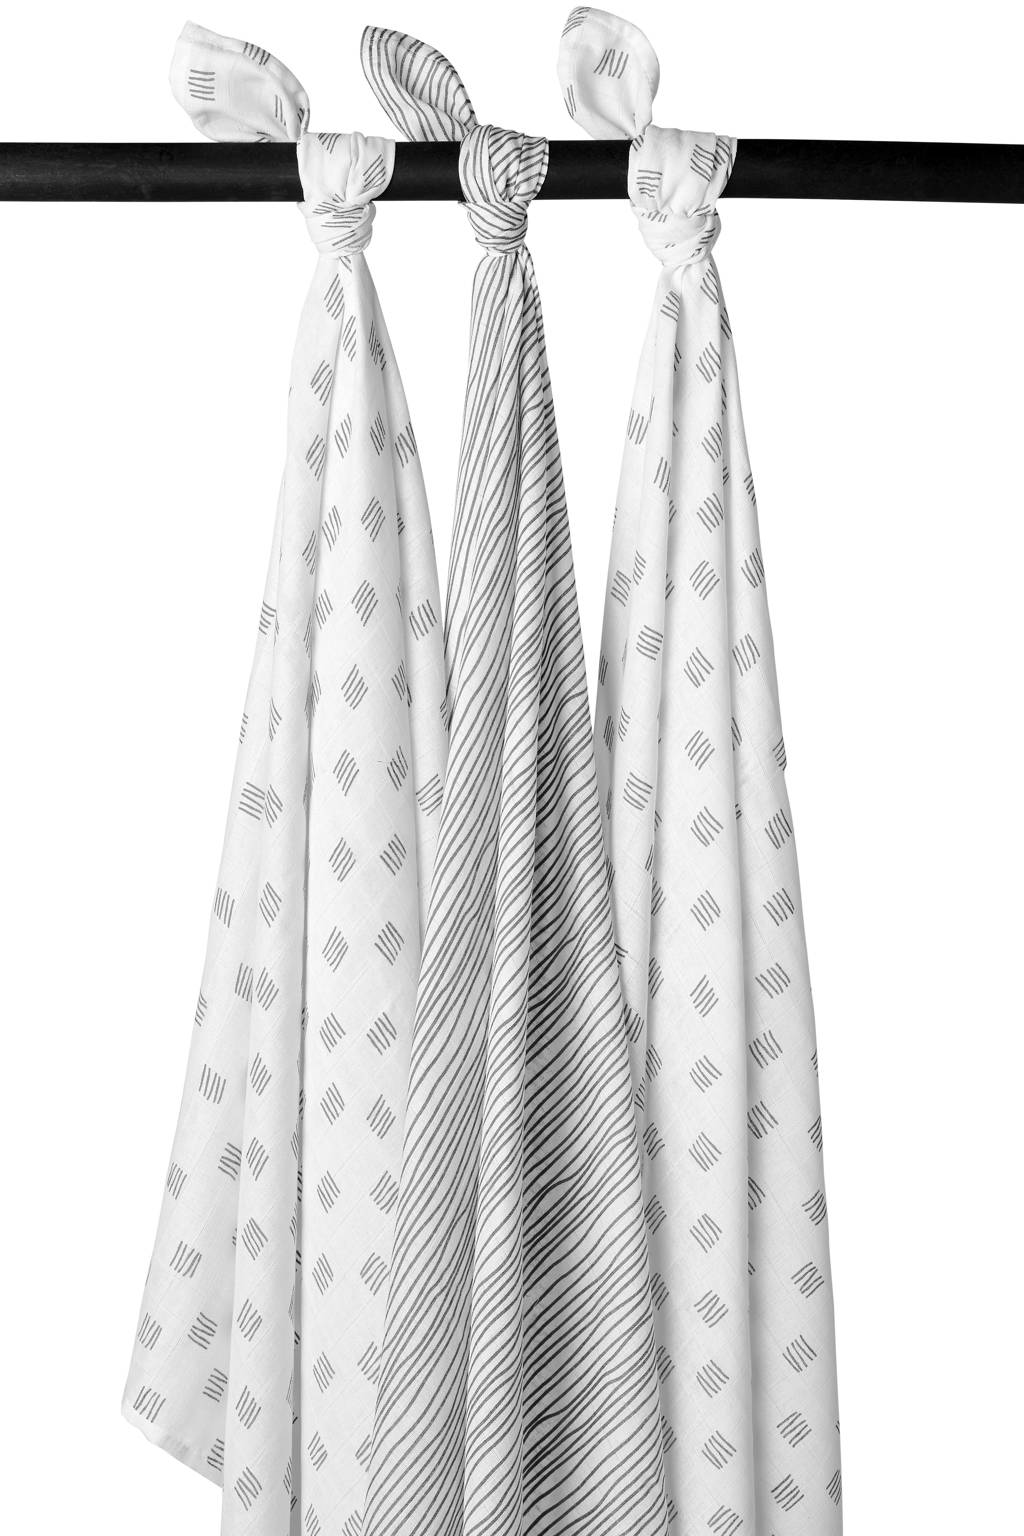 Meyco hydrofiele luiers - set van 3 Block stripe grijs, Grijs